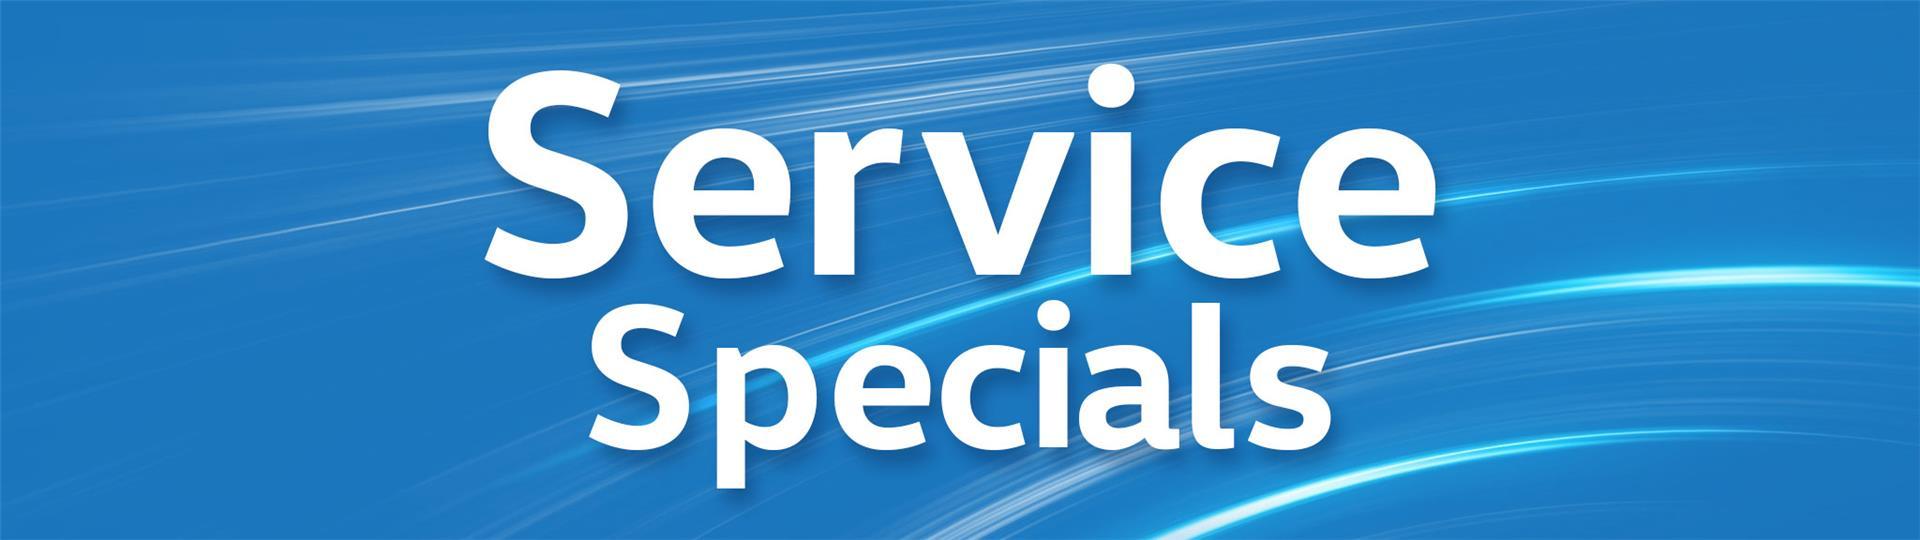 service-special-header